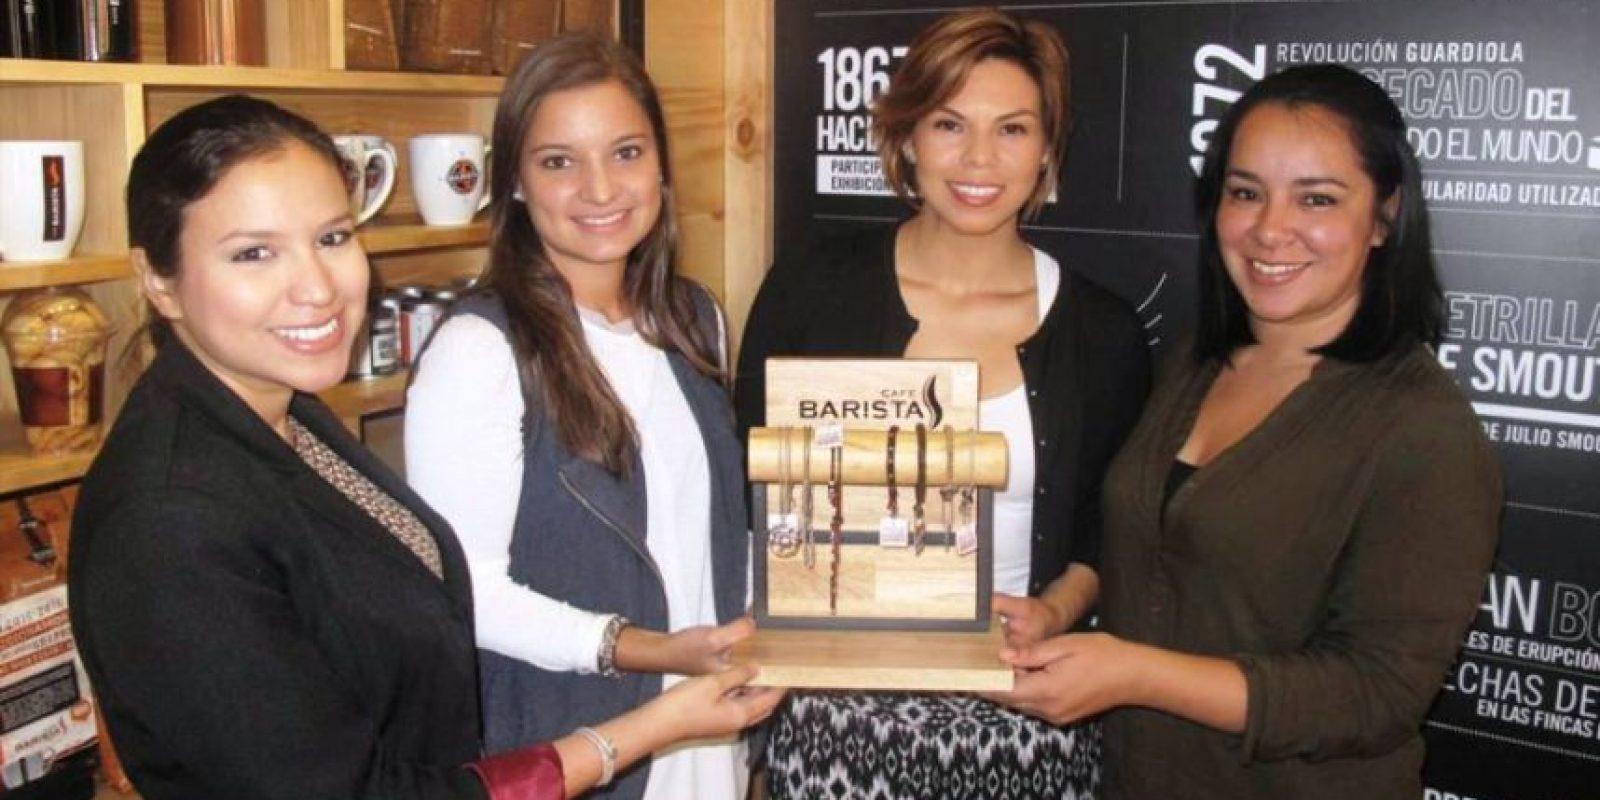 Foto:Cortesía Wakami / Café Barista